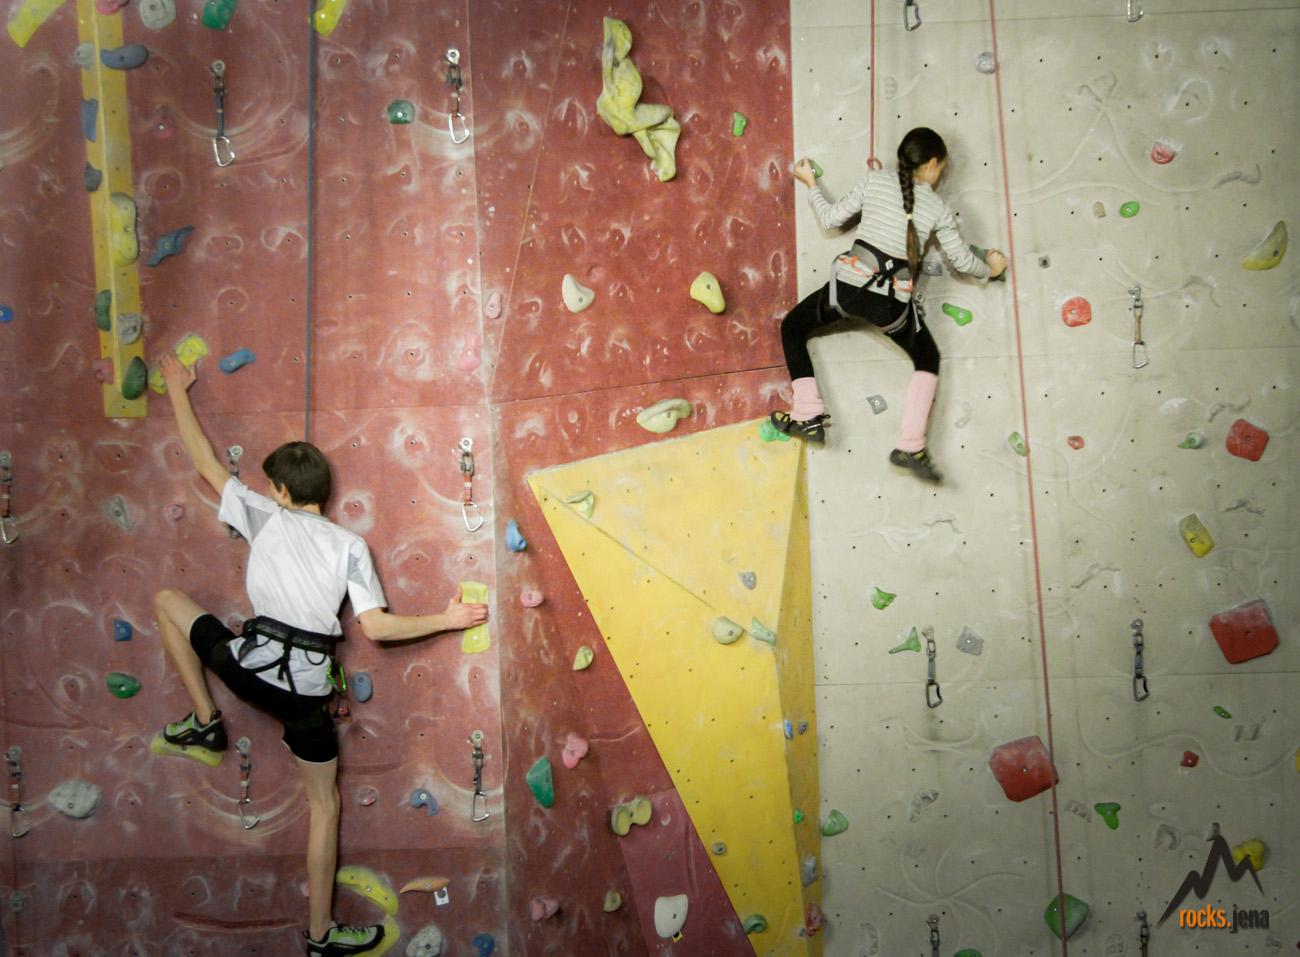 Kletterausrüstung Kinder : Kinderklettern archives kletterzentrum rocks